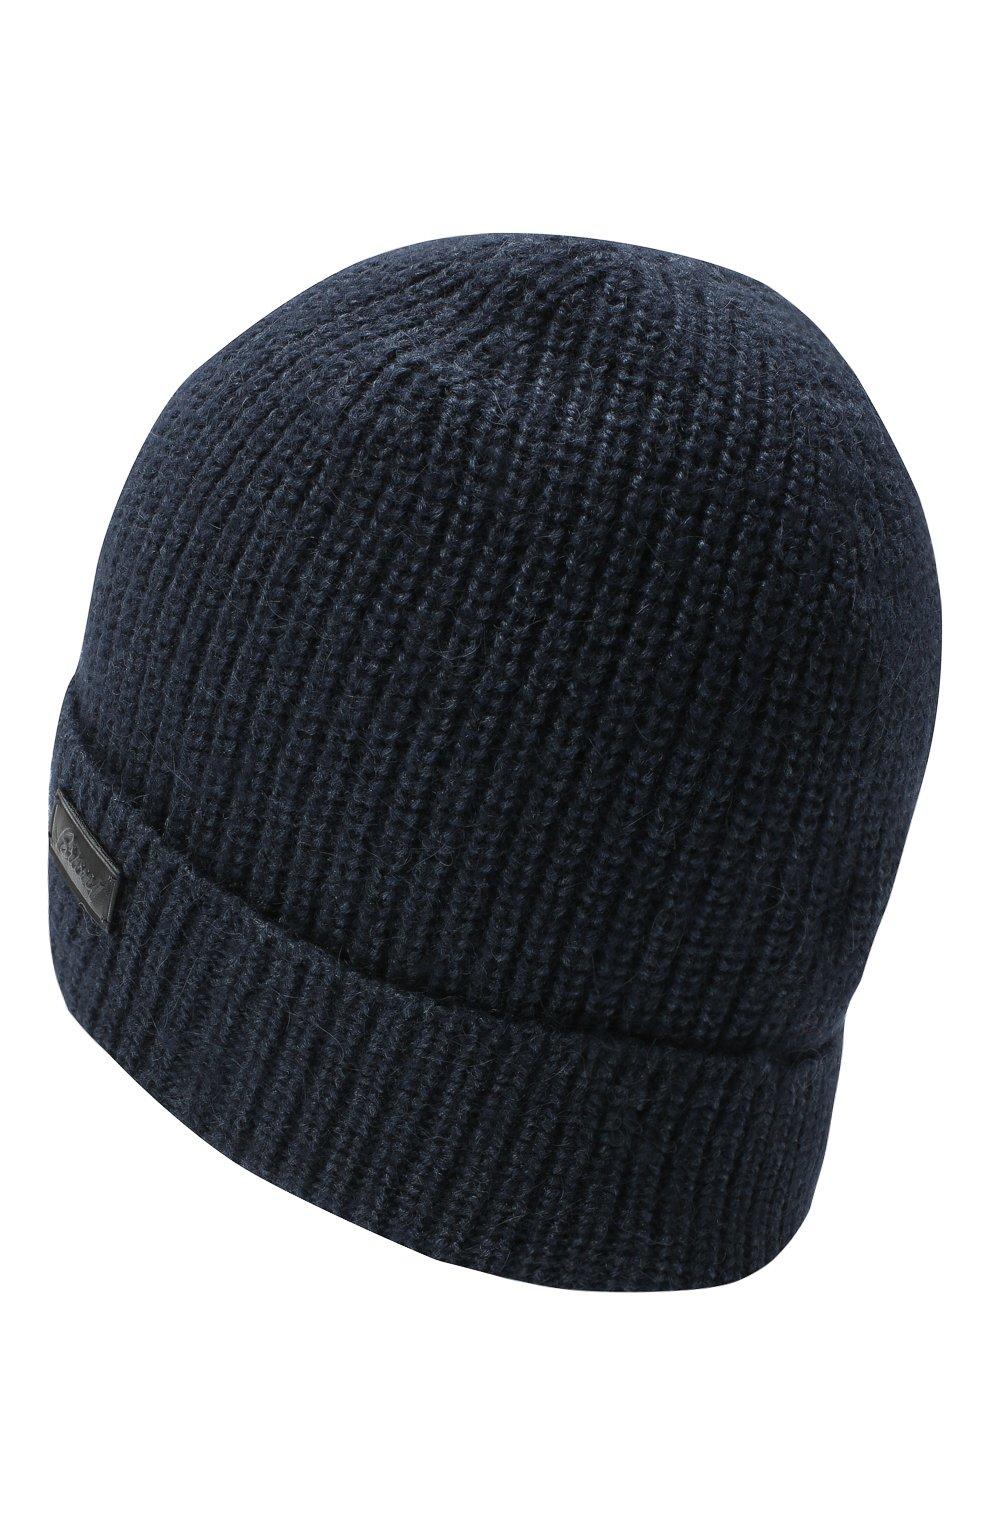 Мужская шапка из шерсти и шелка BRIONI синего цвета, арт. 04M80L/09K32 | Фото 2